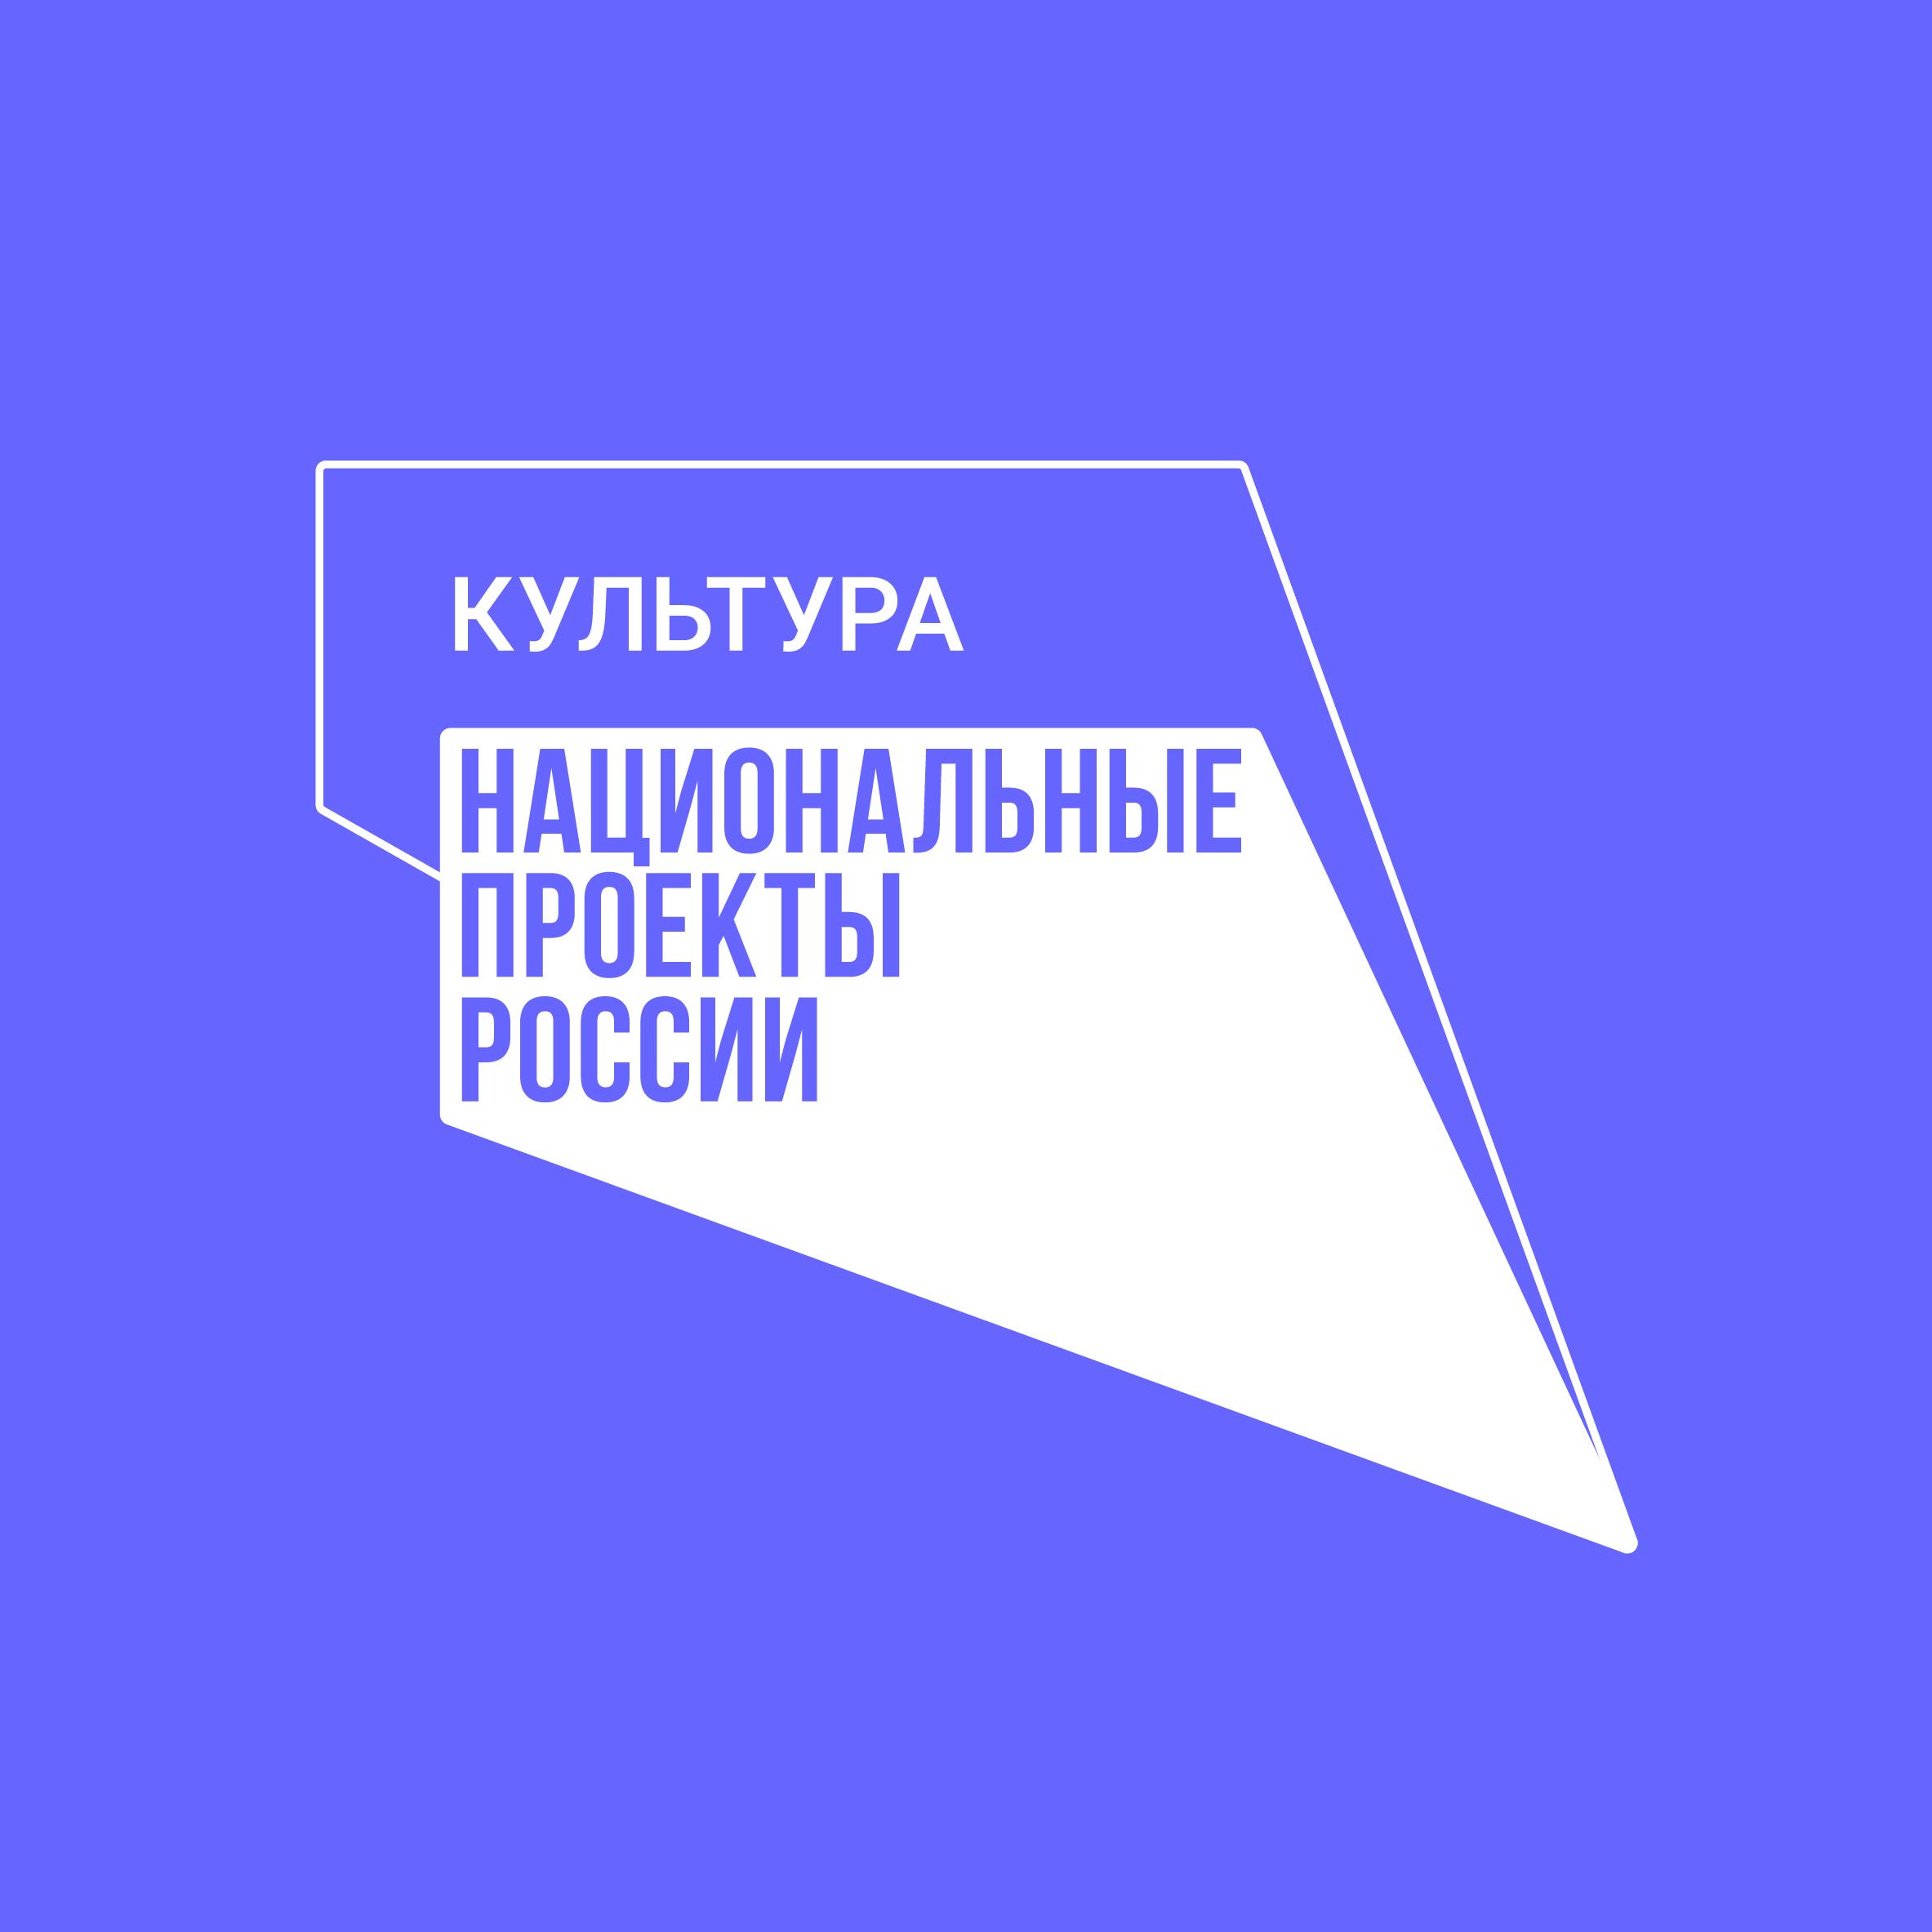 Сайт КУЛЬТУРА ОРЕНБУРЖЬЯ